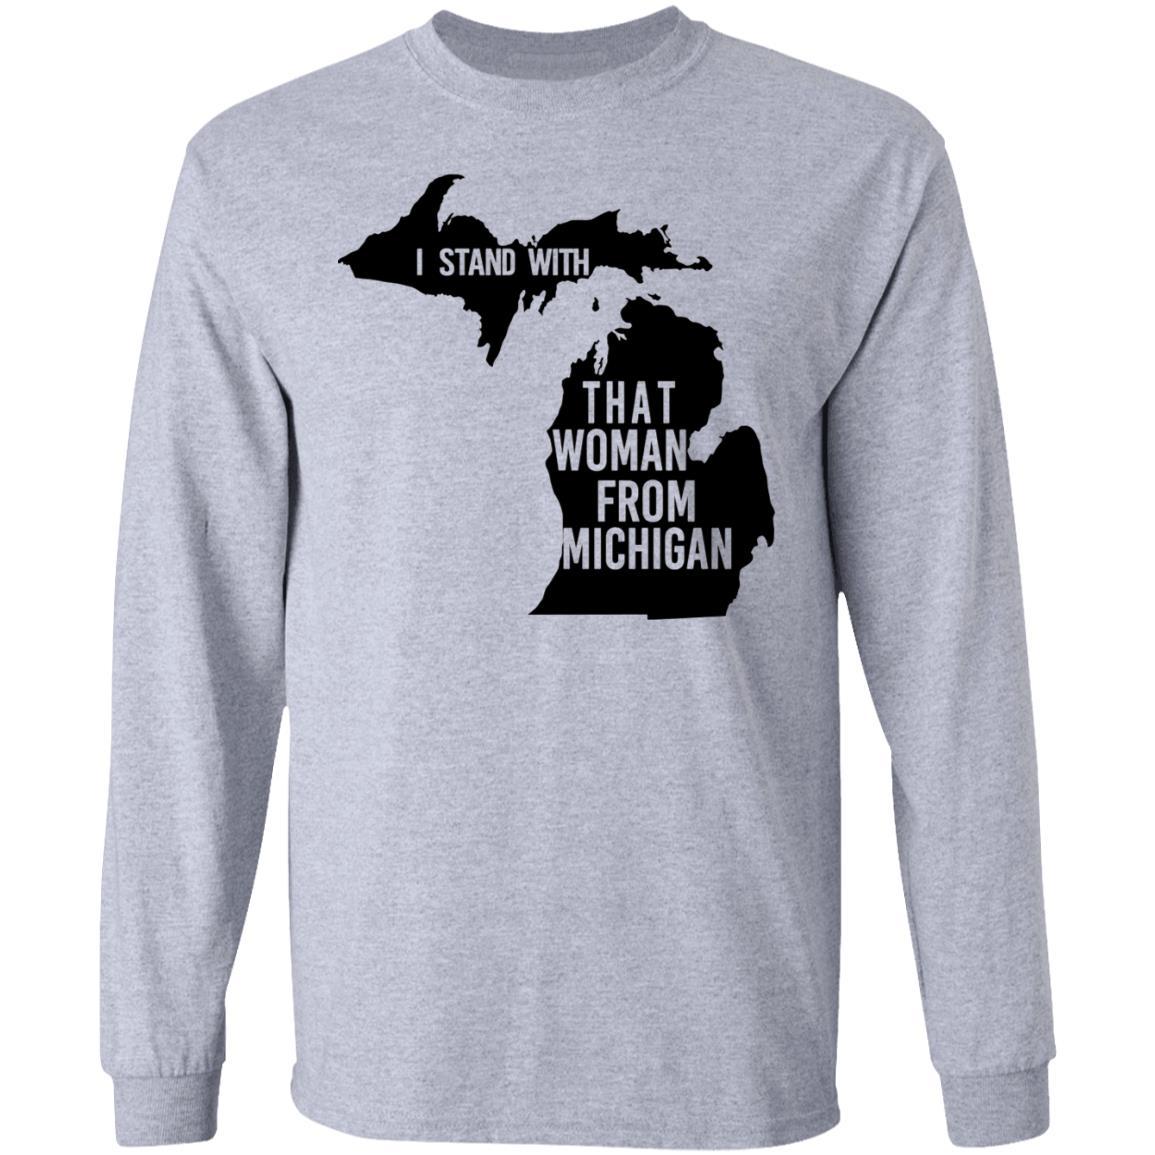 Mad Over Shirts Fly Fishing Michigan Unisex Premium Tank Top